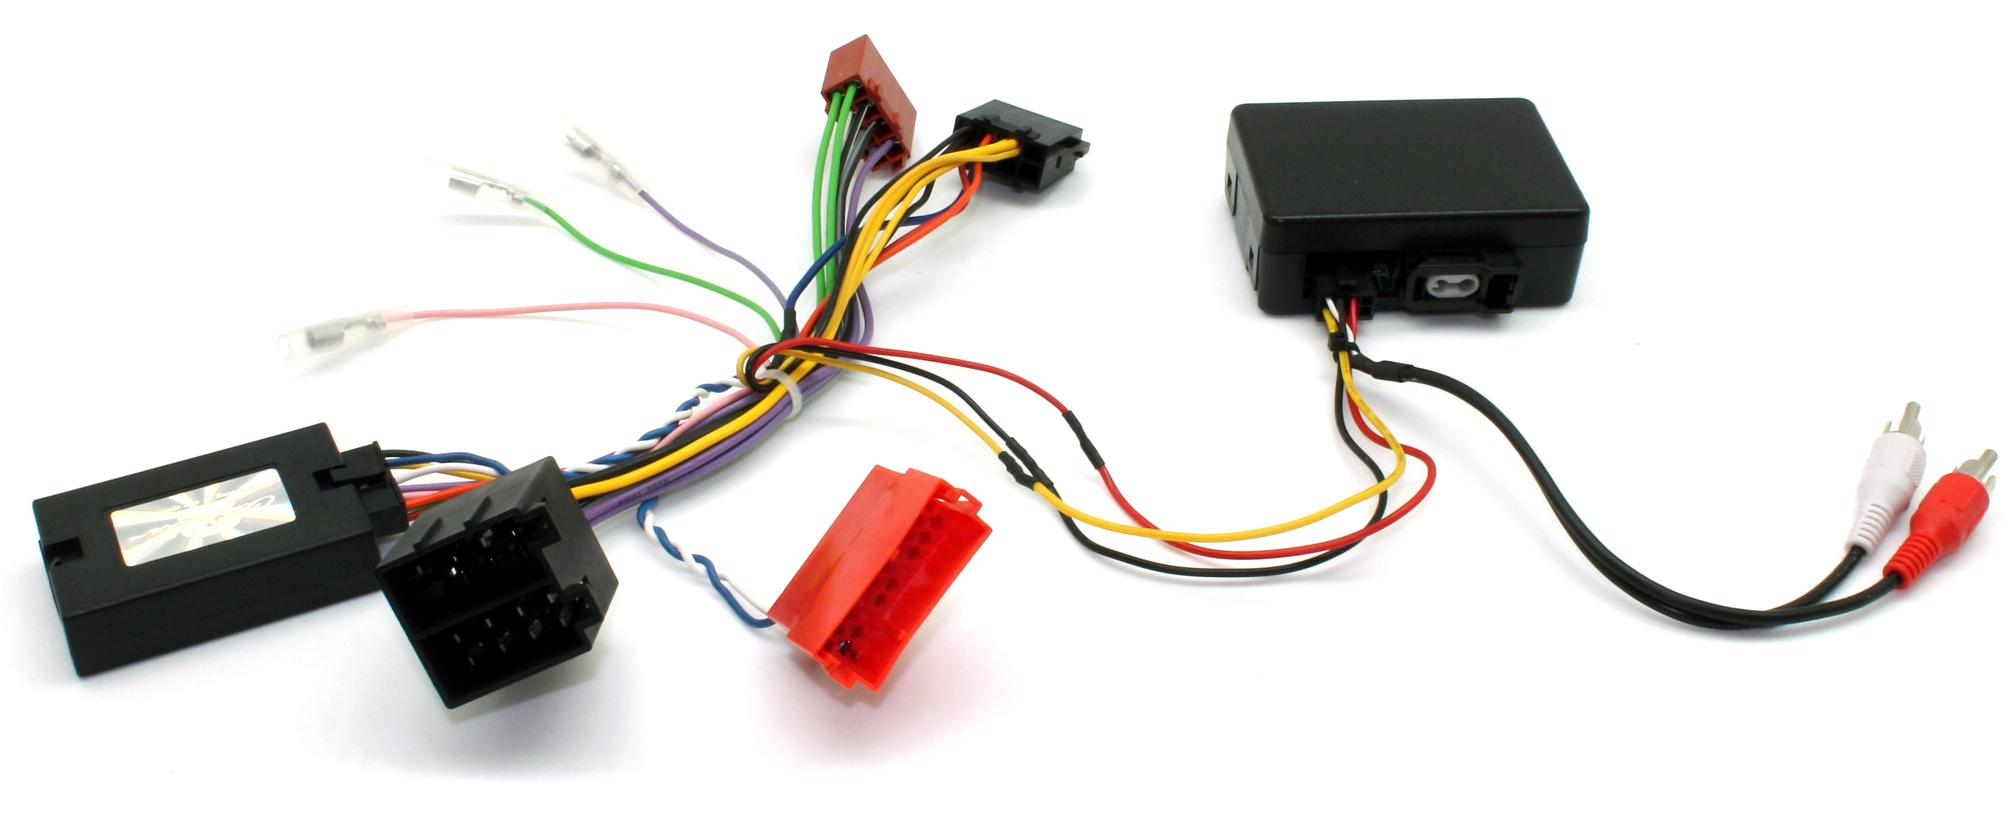 Porsche Fiber Optic Amplifier Retention Interface Ctspo005 2 Sub Amps Hu Wiring Diagram